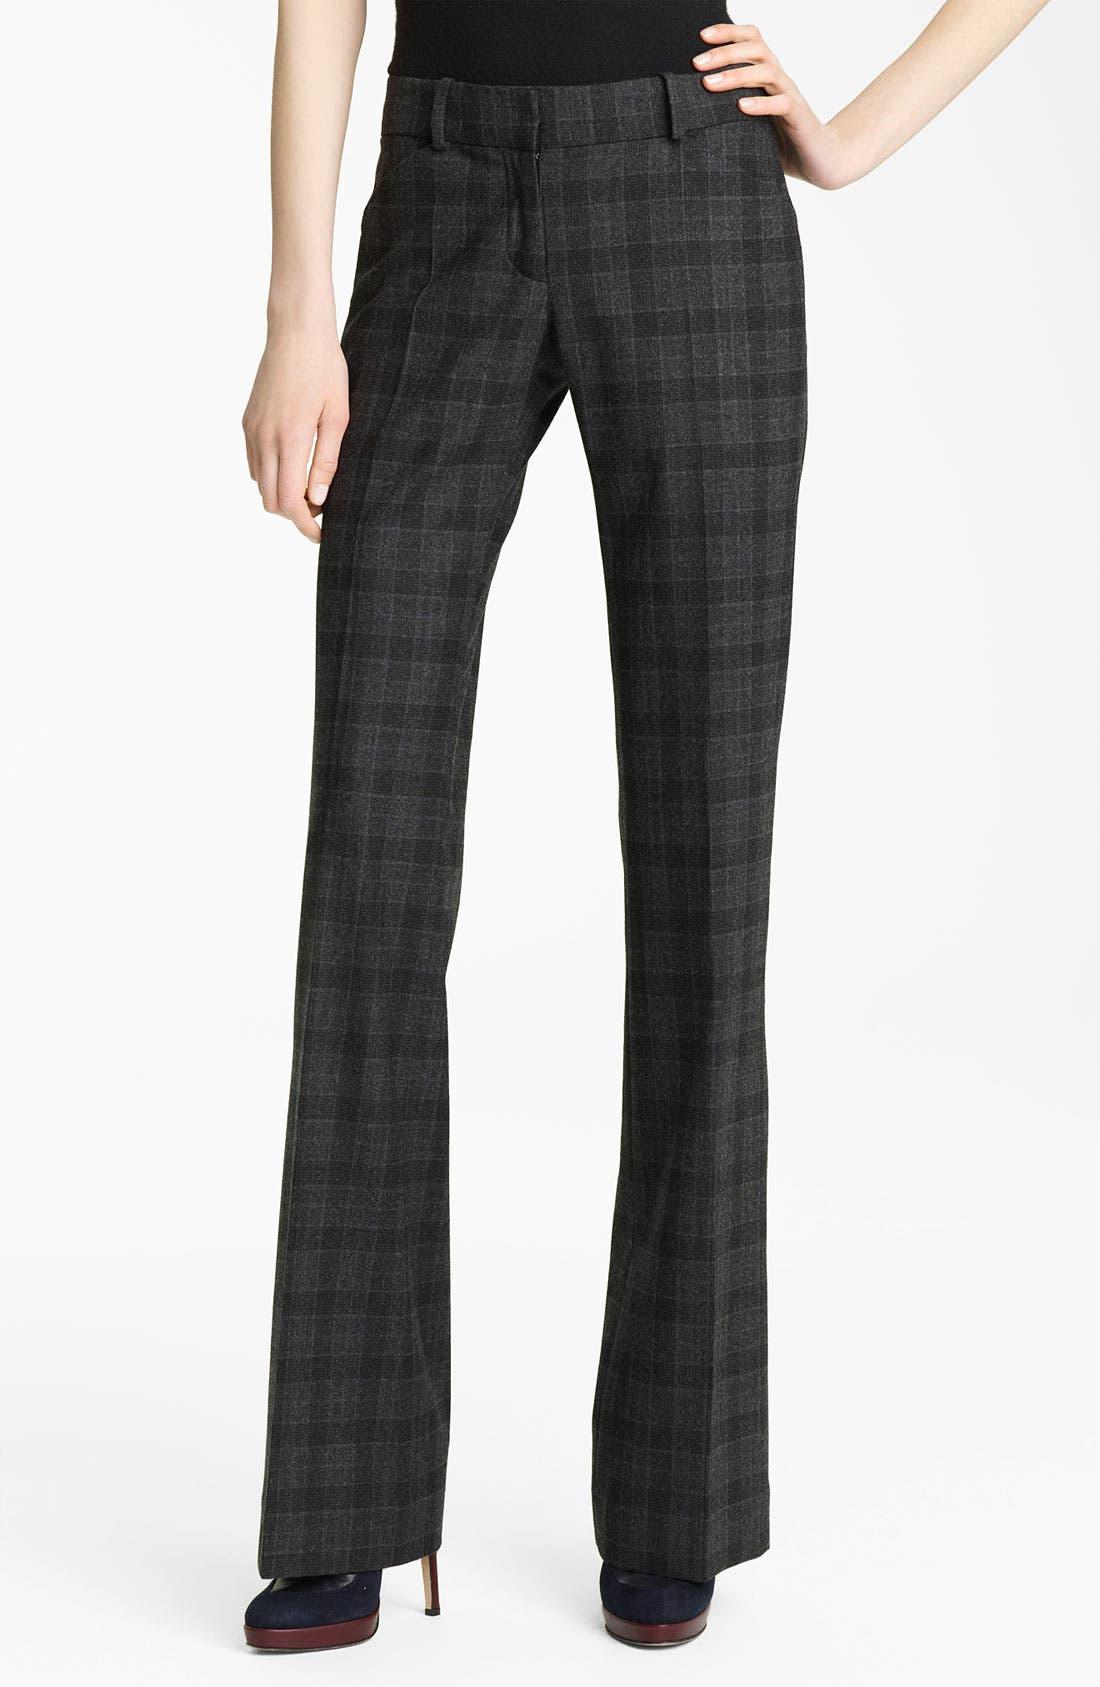 Alternate Image 1 Selected - Oscar de la Renta Plaid Flannel Trousers